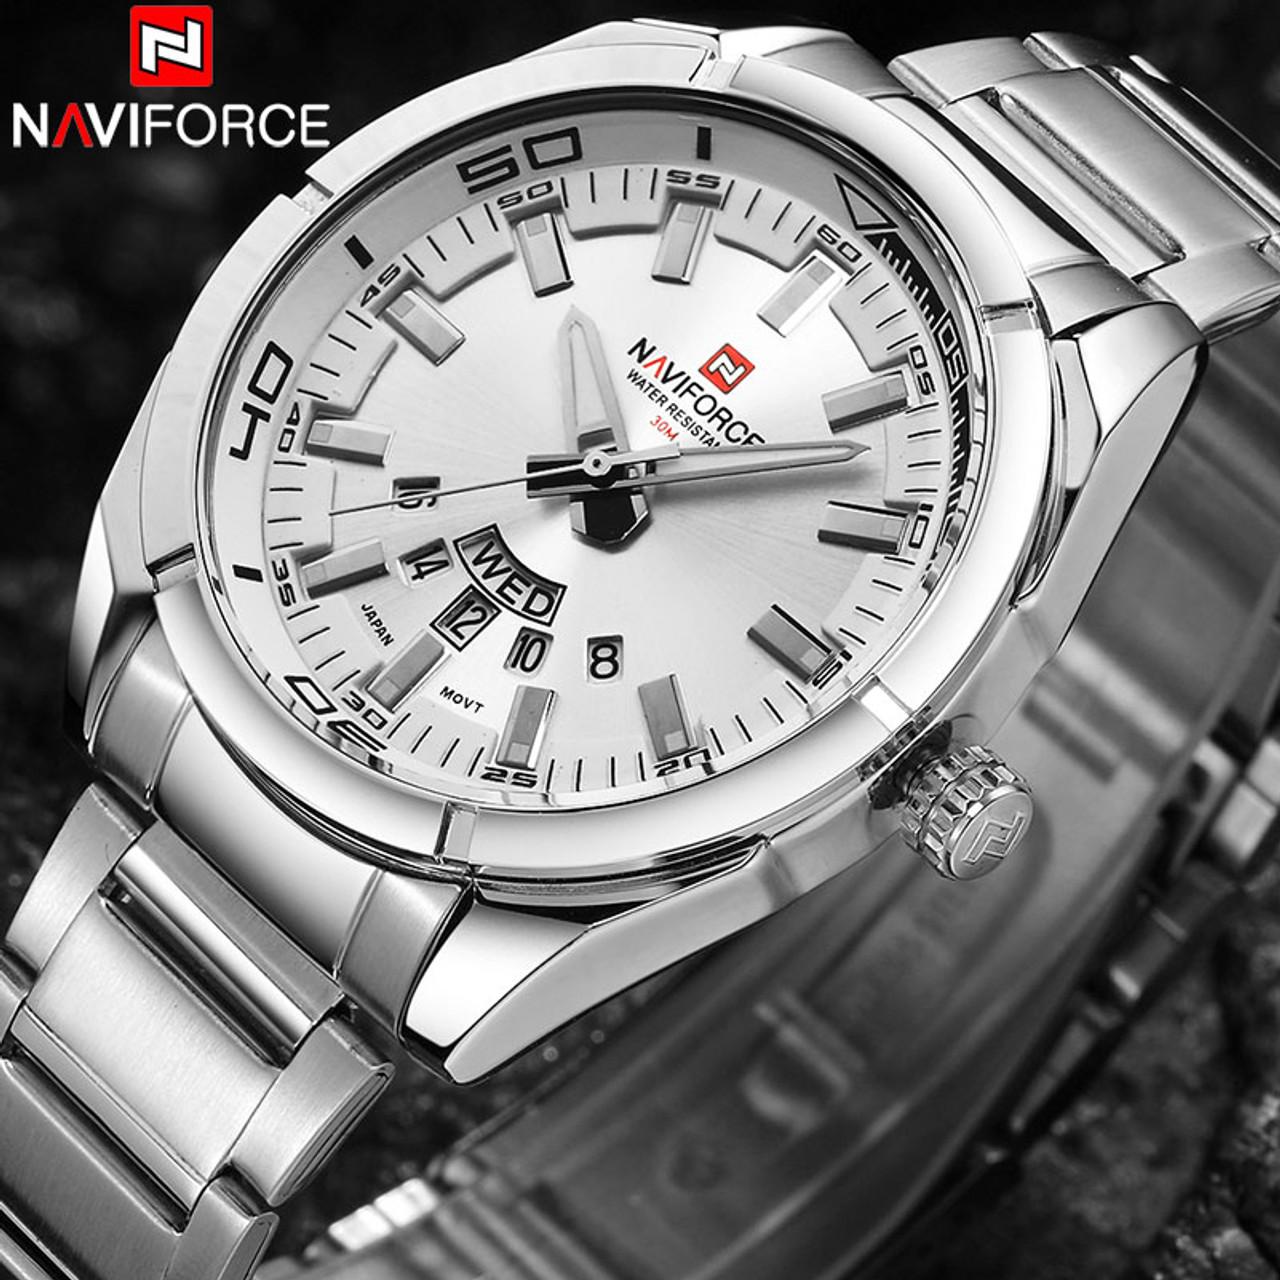 68996a2d52 NAVIFORCE Brand Men Watches Luxury Sport Quartz 30M Waterproof Watches  Men's Stainless Steel Band Auto Date ...